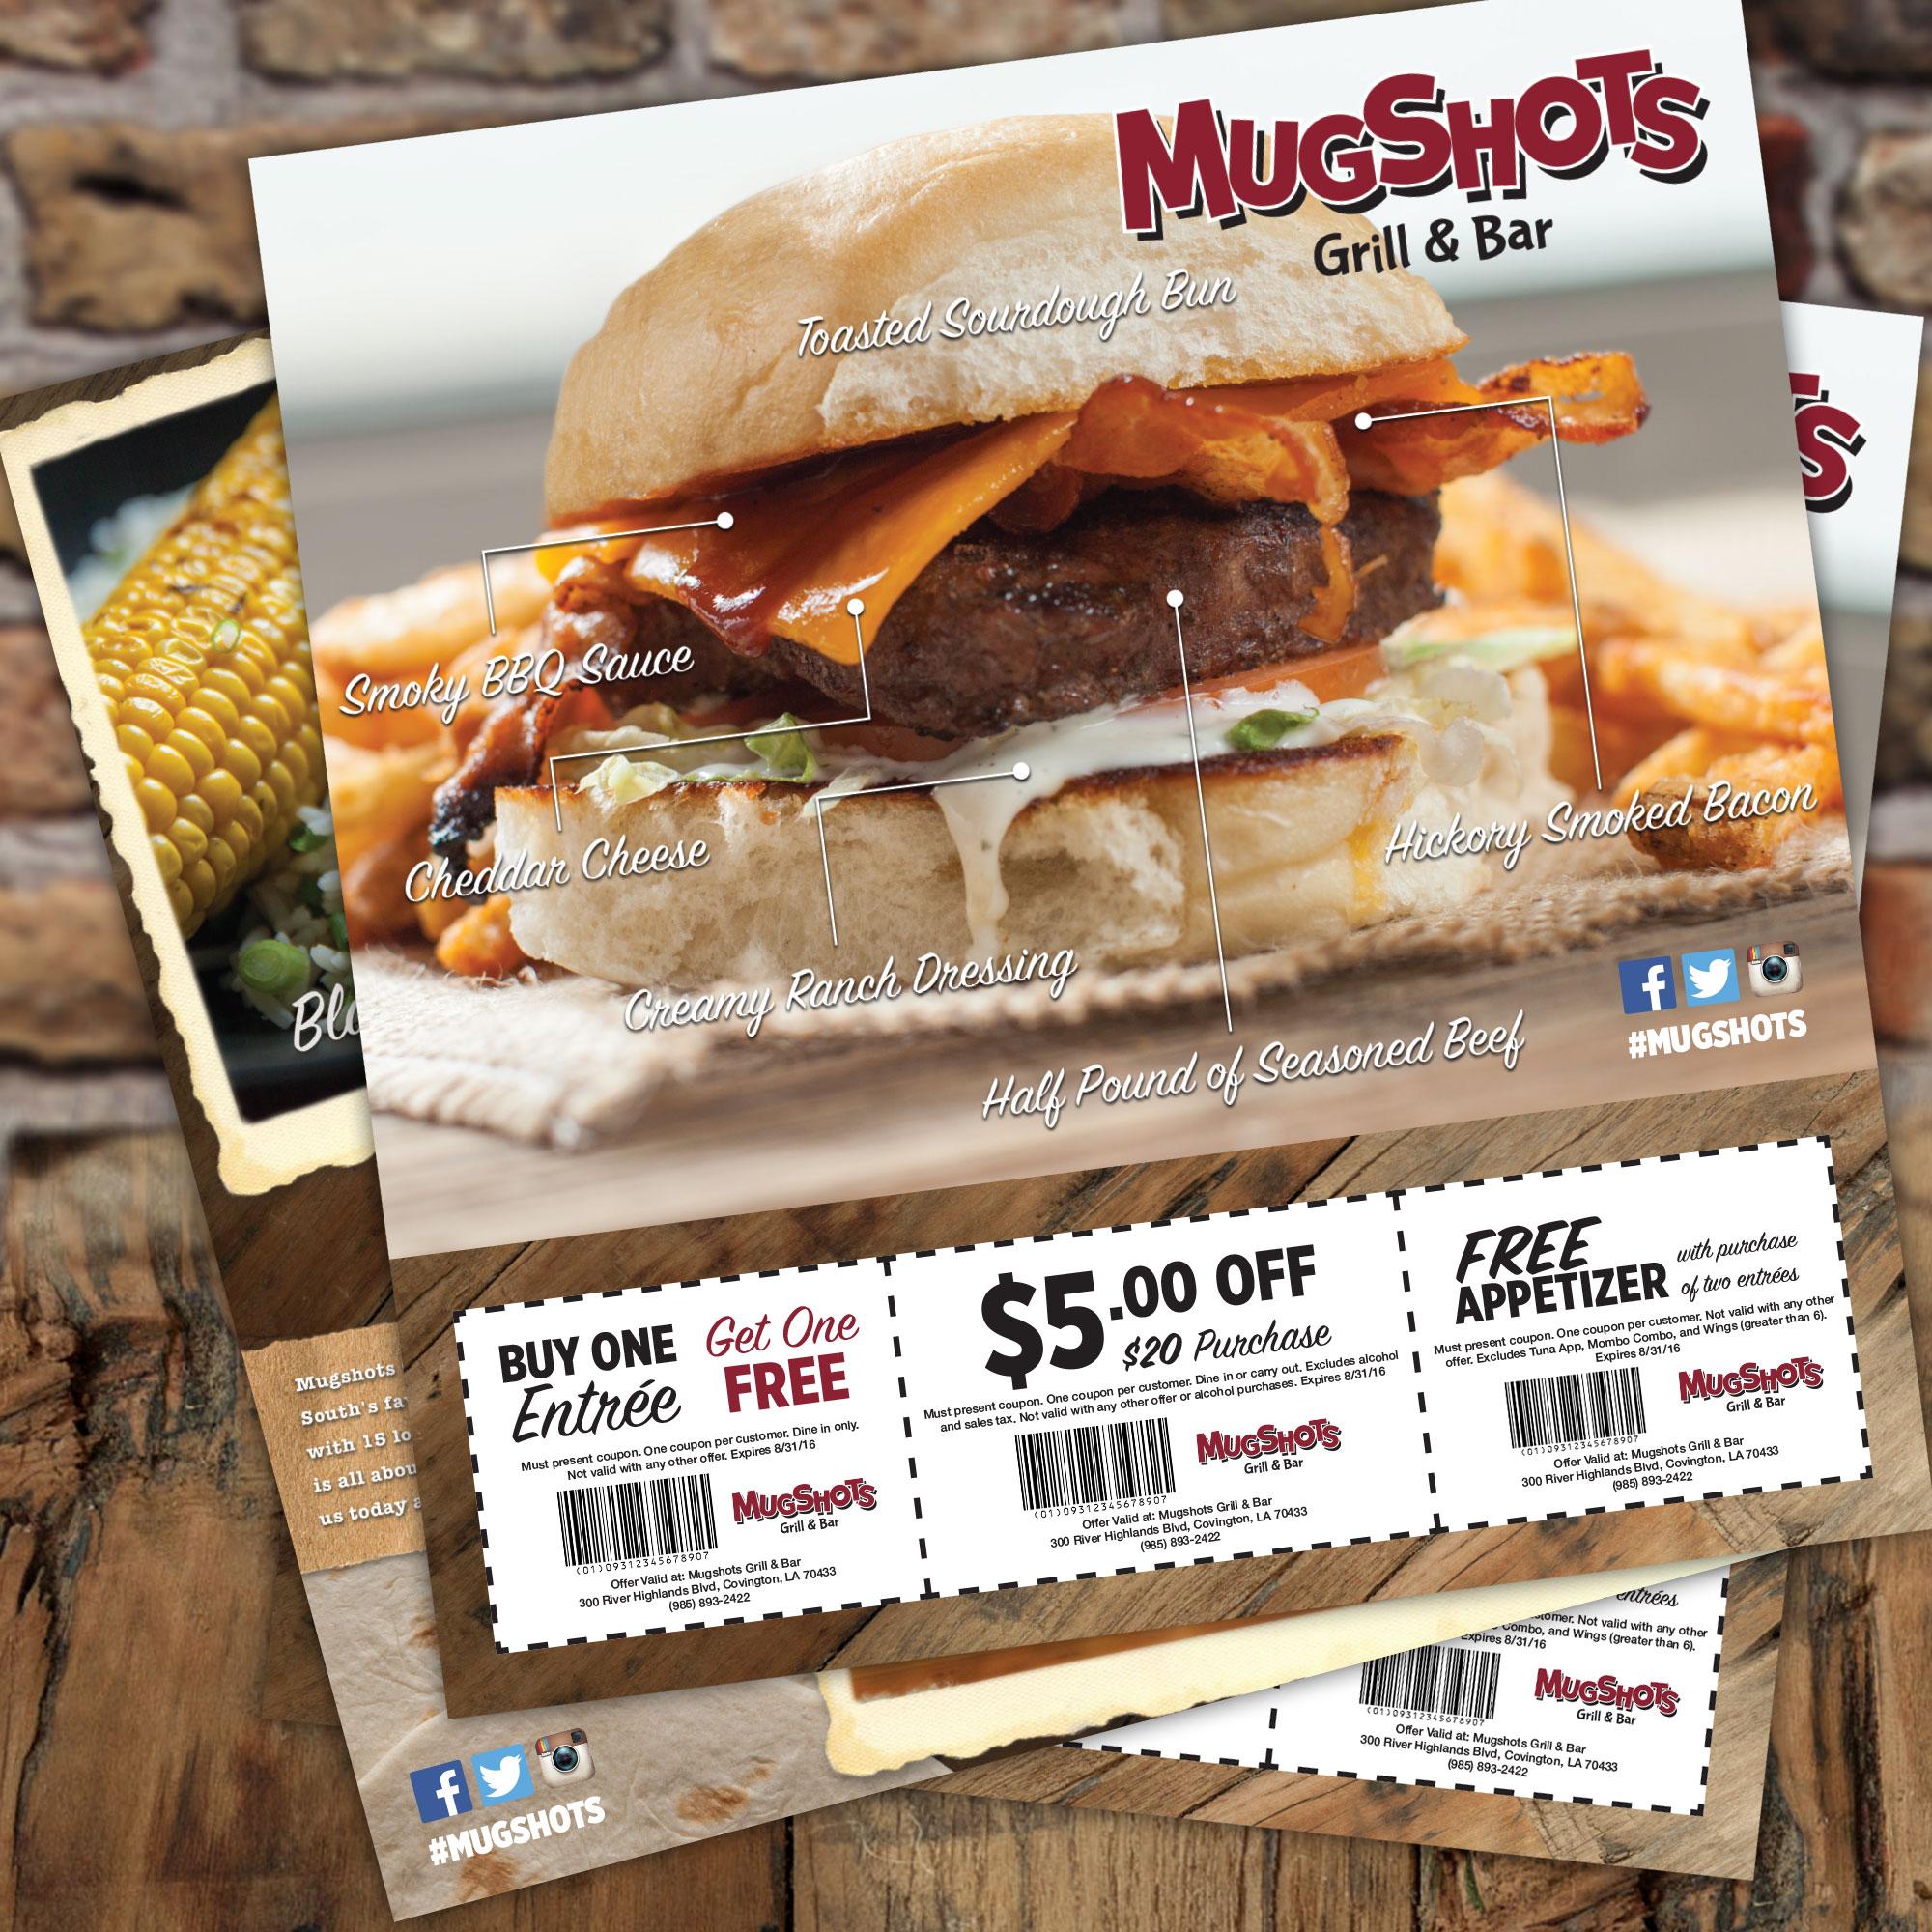 Direct Mail Campaign: Mugshots Grill & Bar